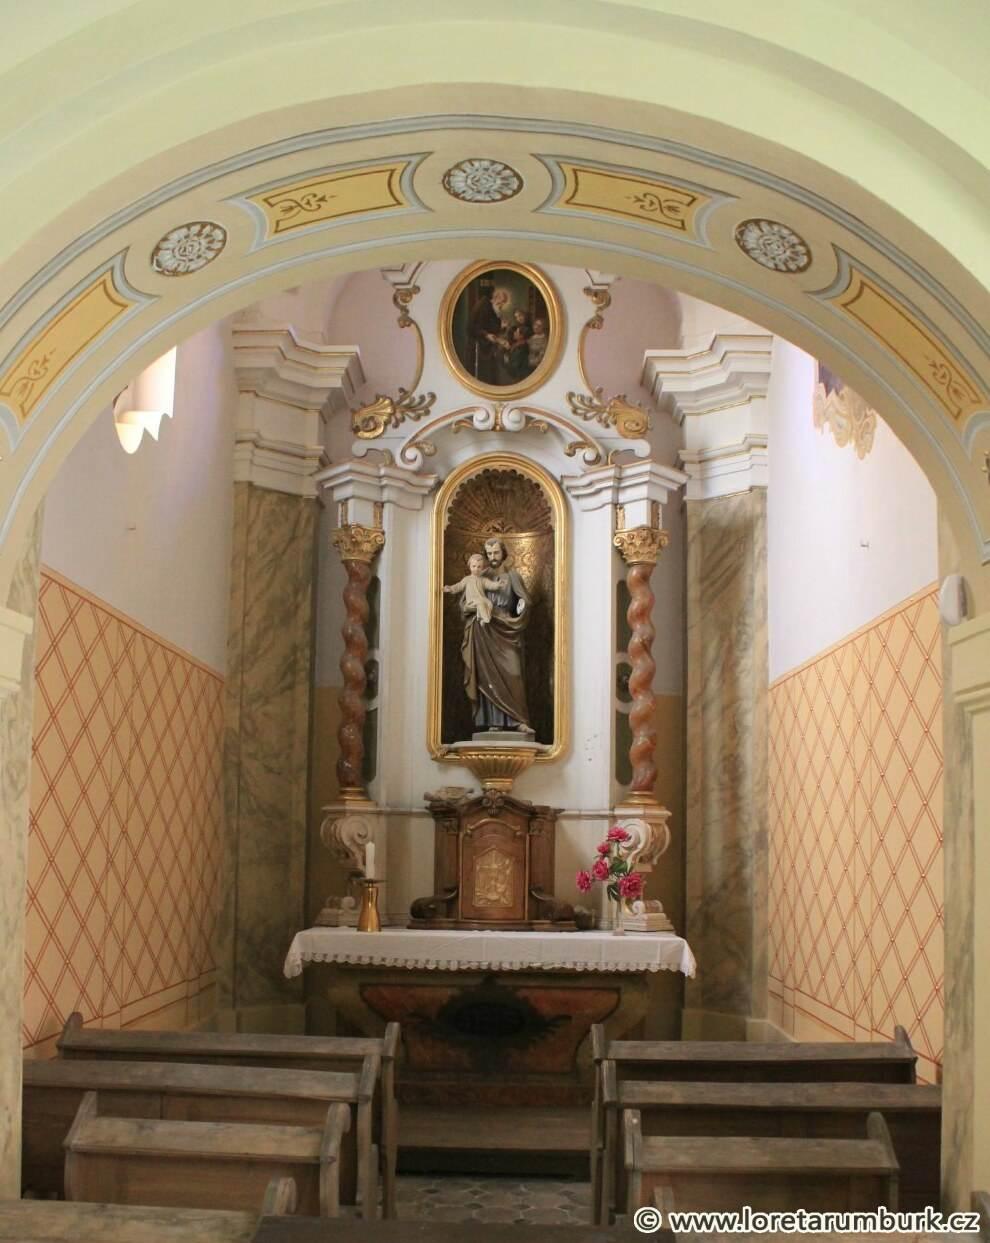 5, Loreta Rumburk, kaple sv Josefa, stav po restaurování, 17 10 2014, foto Klára Mágrová